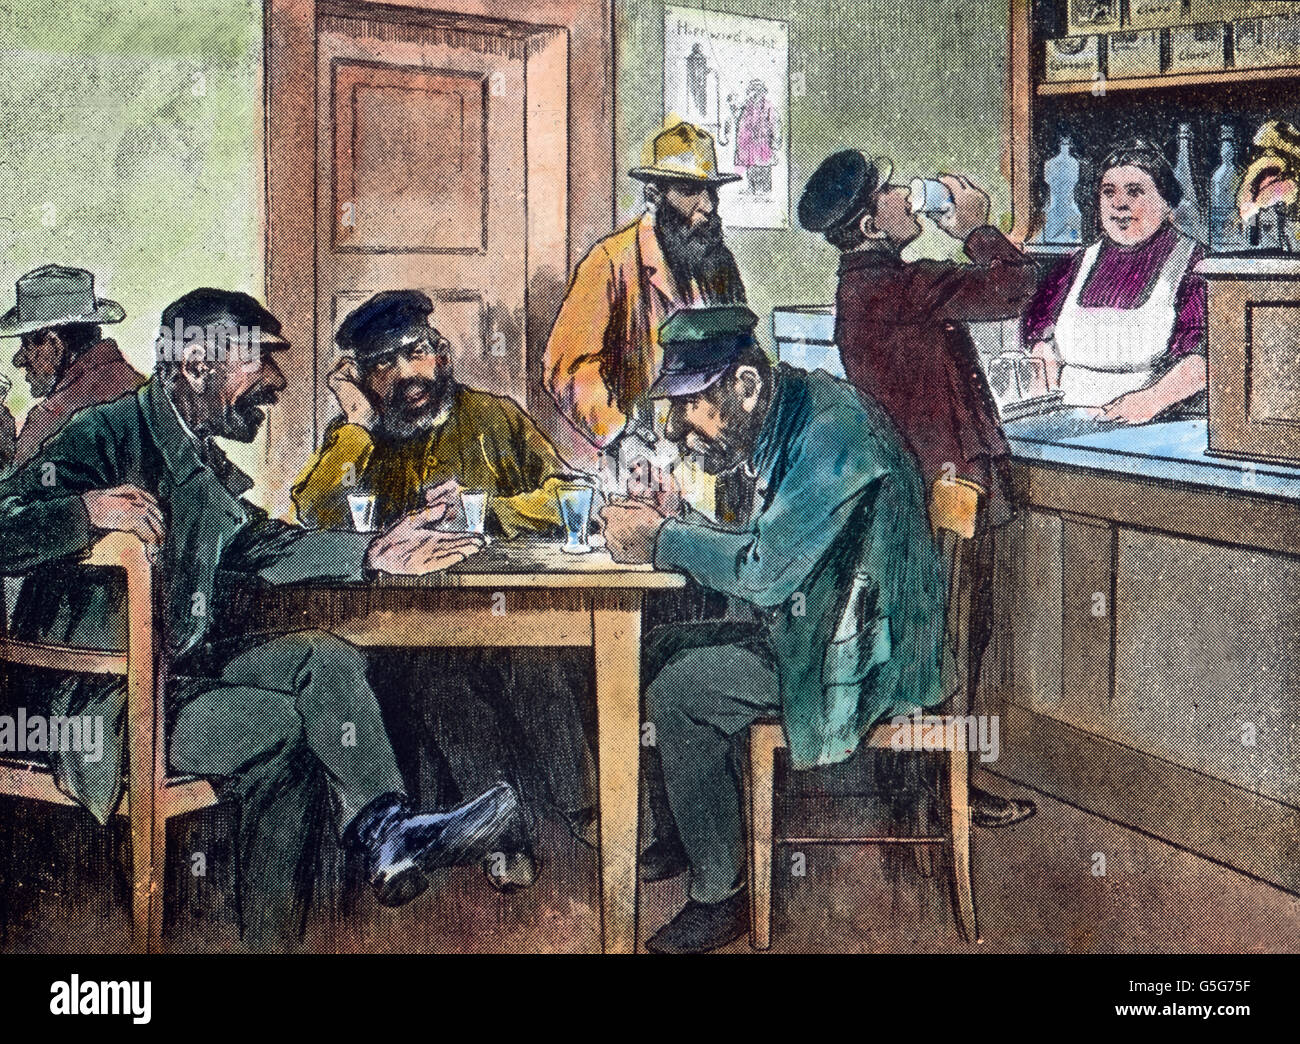 Drinking Bar 1910s Stockfotos & Drinking Bar 1910s Bilder - Alamy